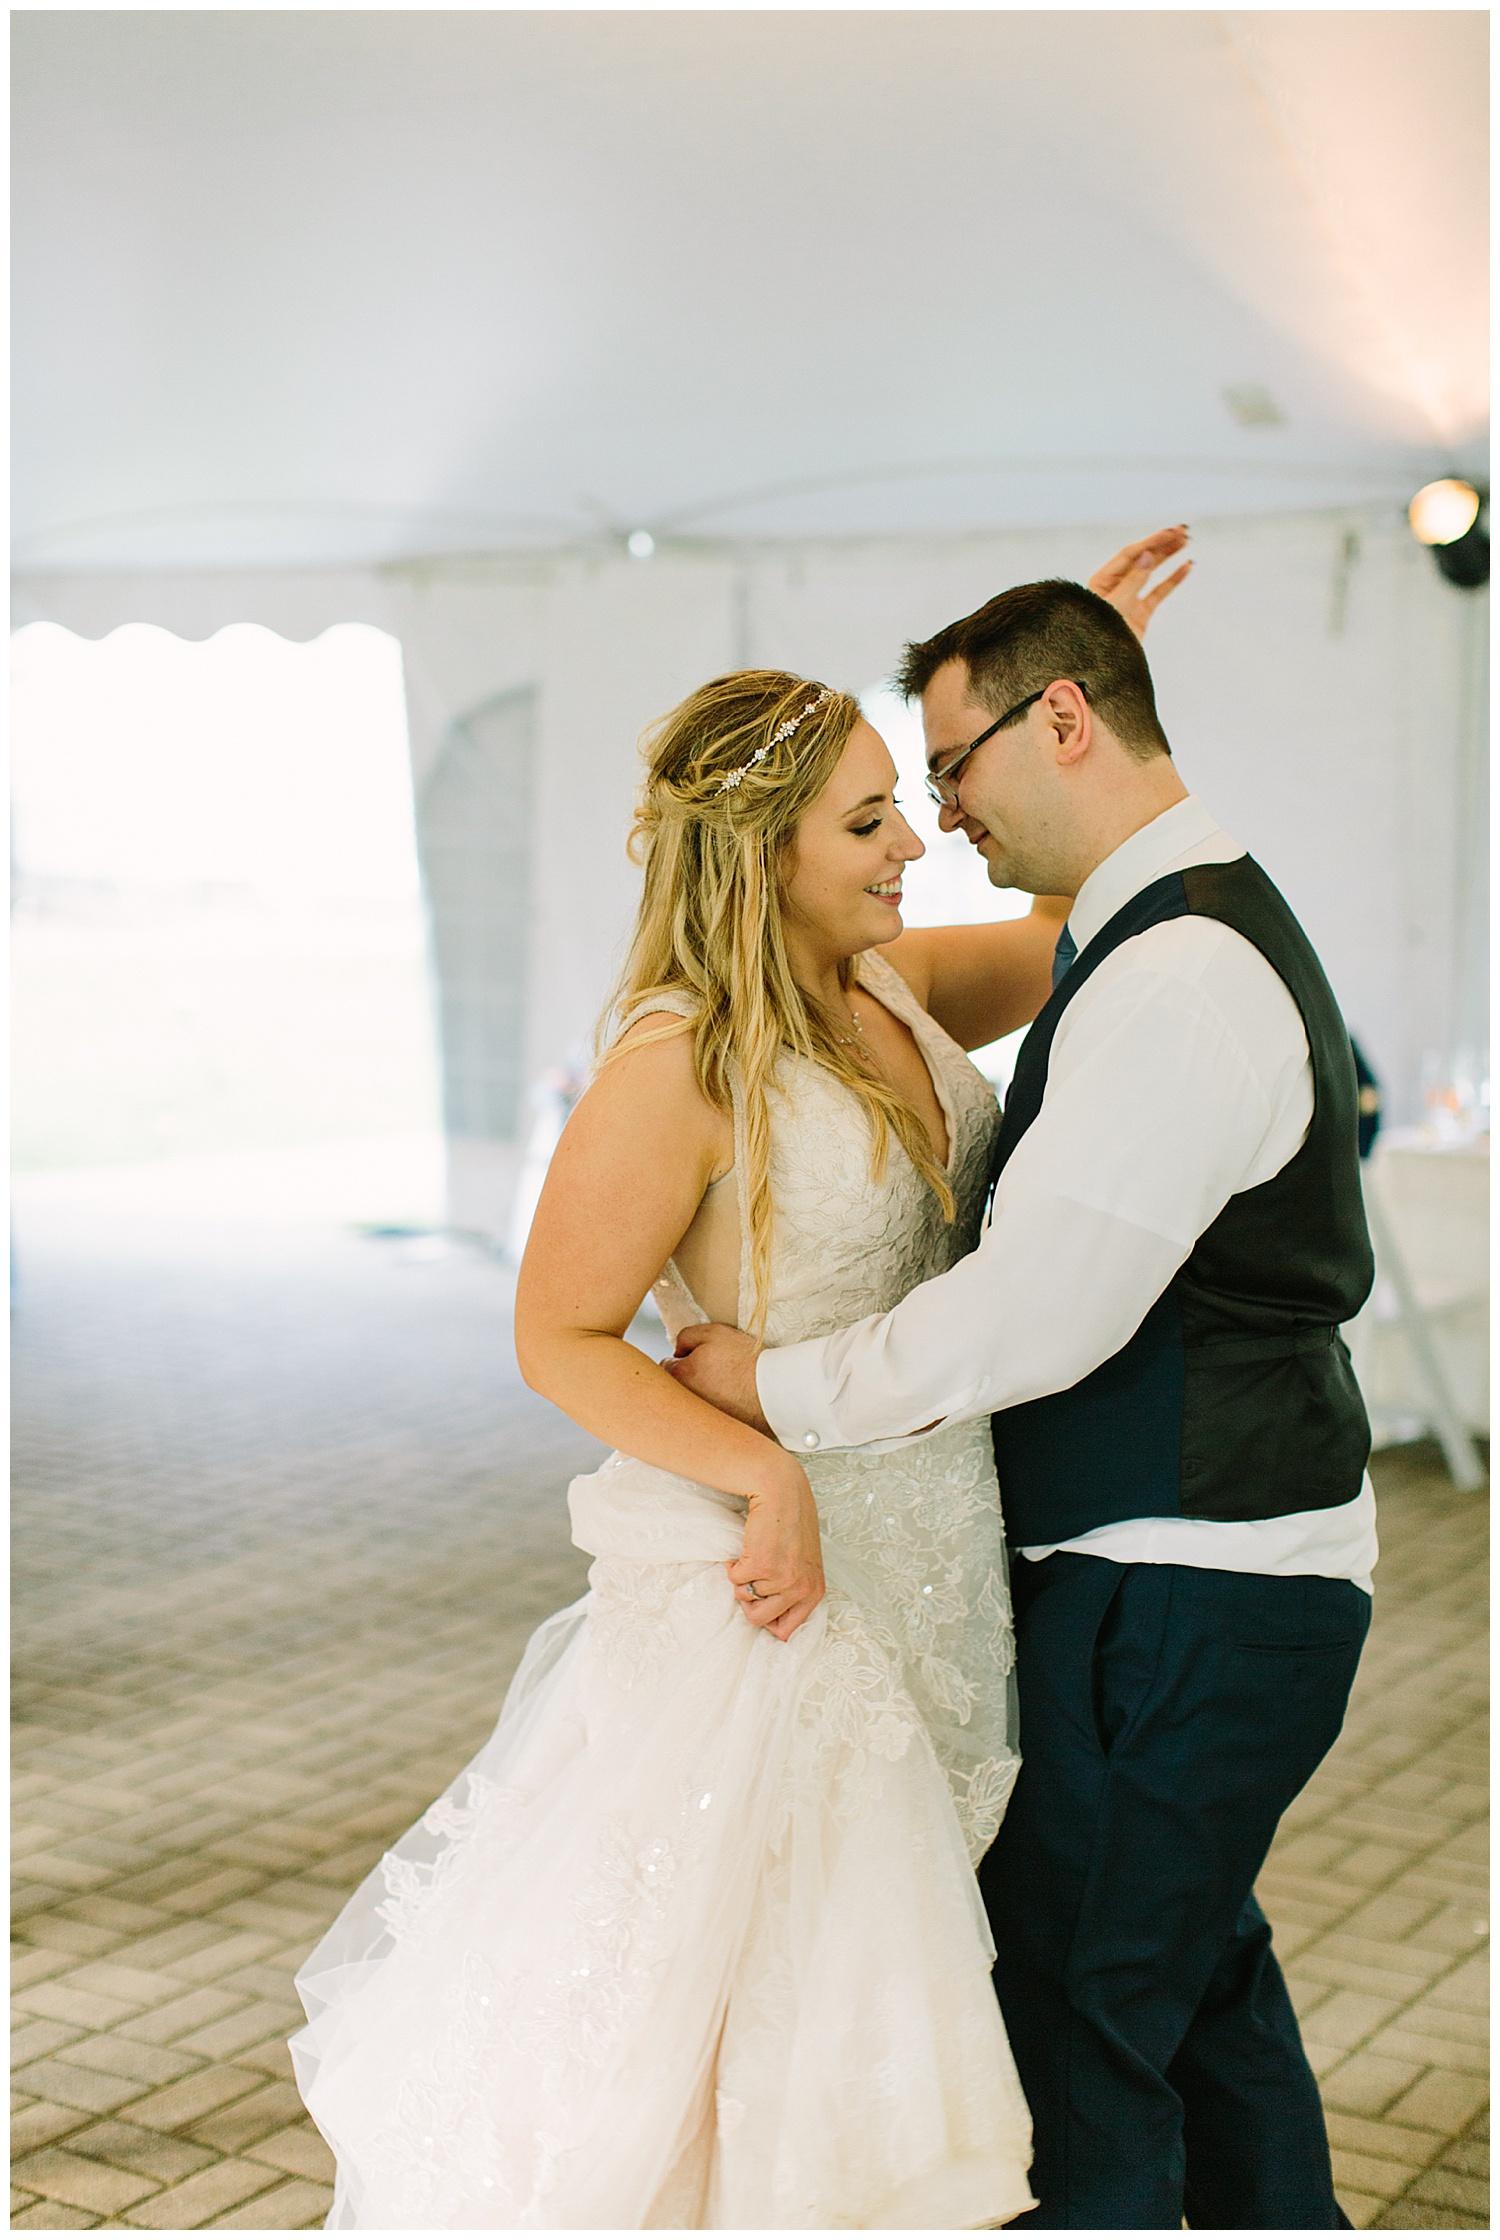 trent.and.kendra.photography.whitehall.wedding-146.jpg